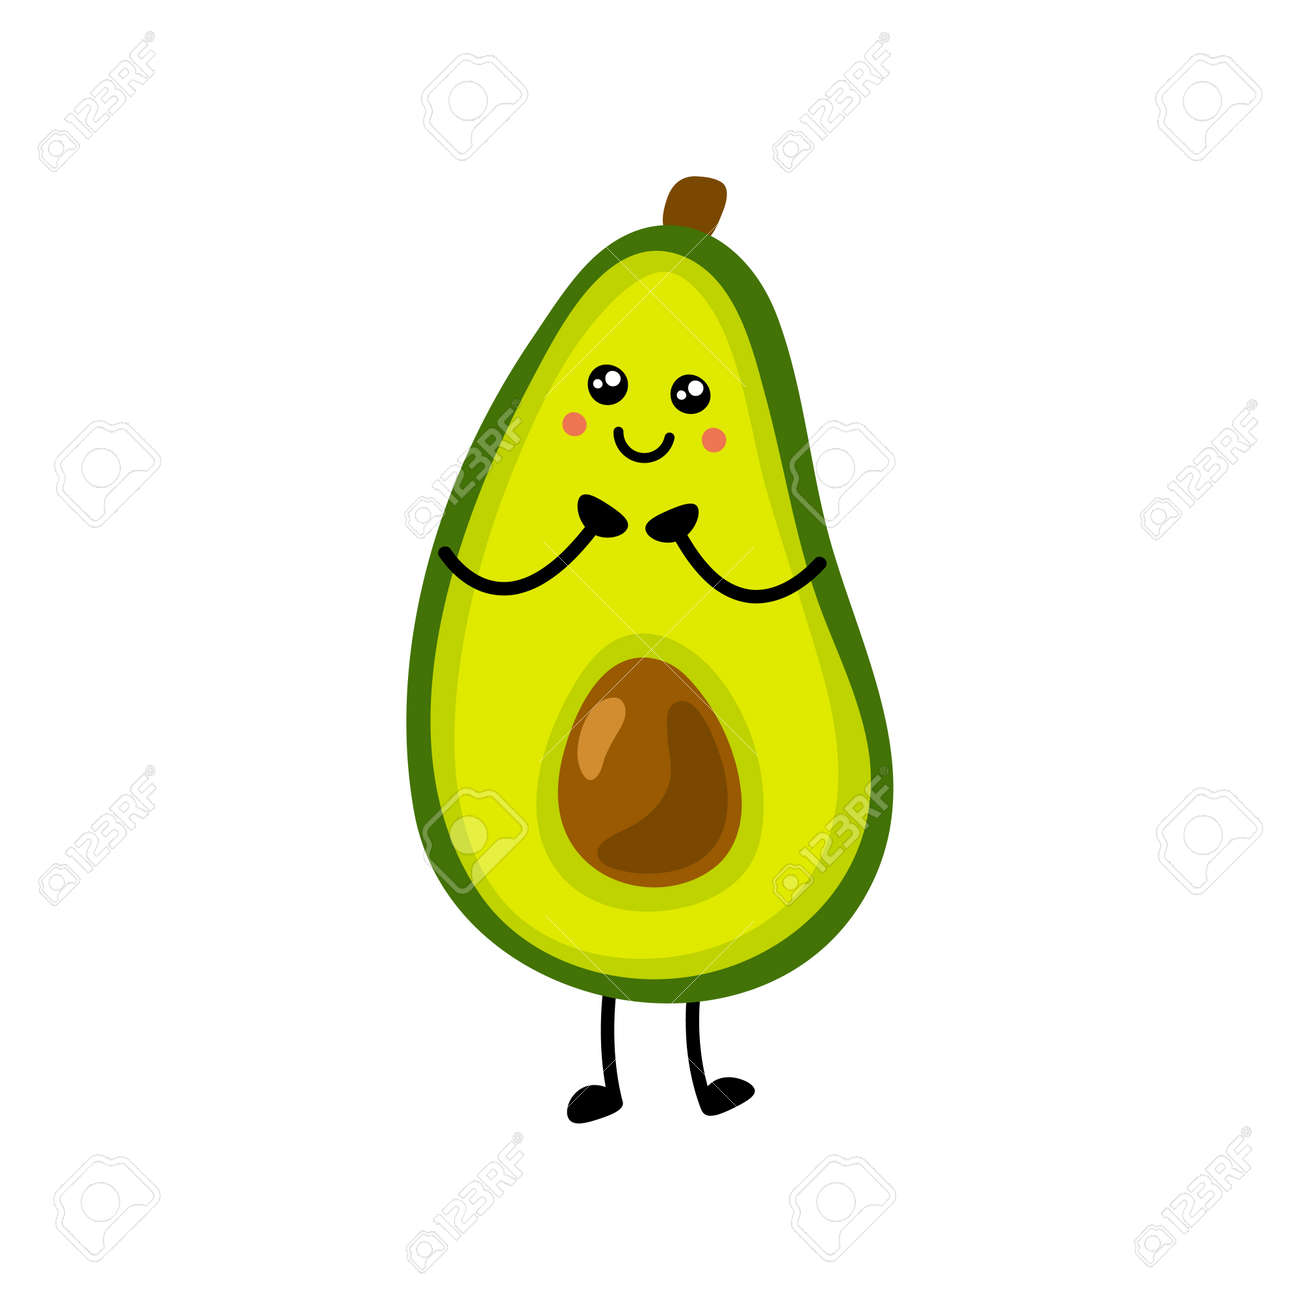 Avocado icon. Flat illustration of avocado vector icon isolated on white background. - 169772078